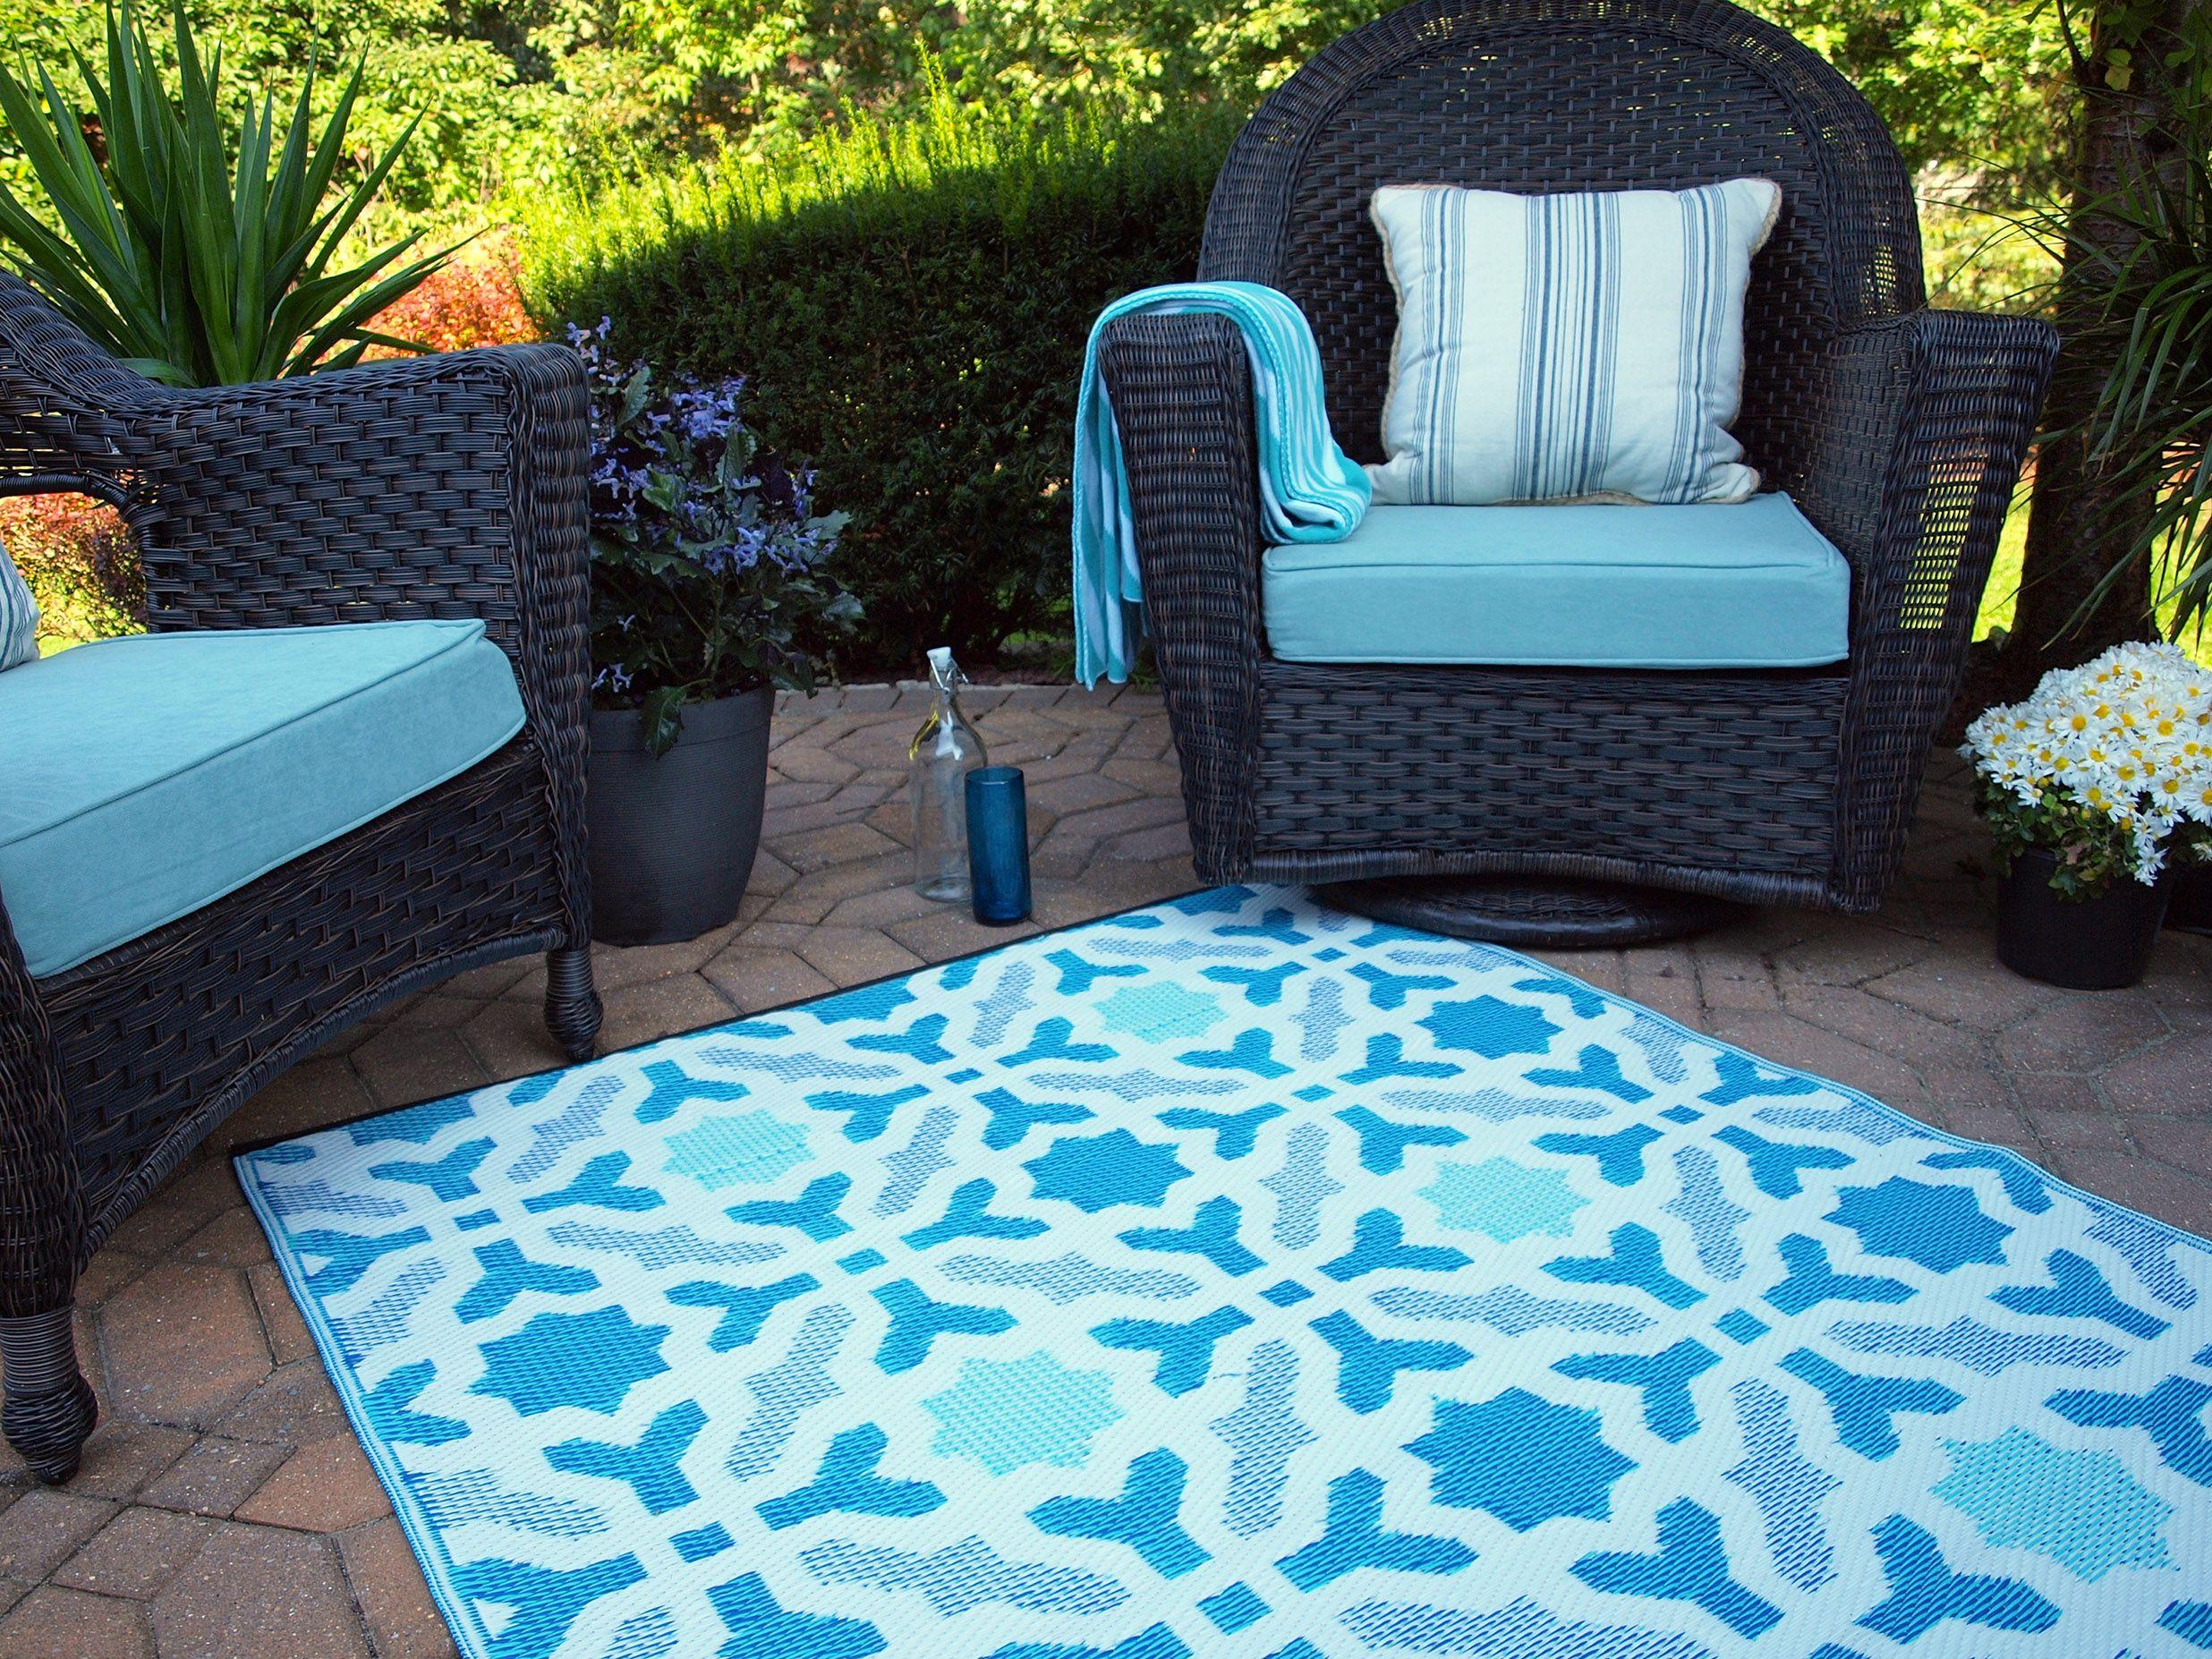 blue seville outdoor rugfab habitat from cuckooland #rug